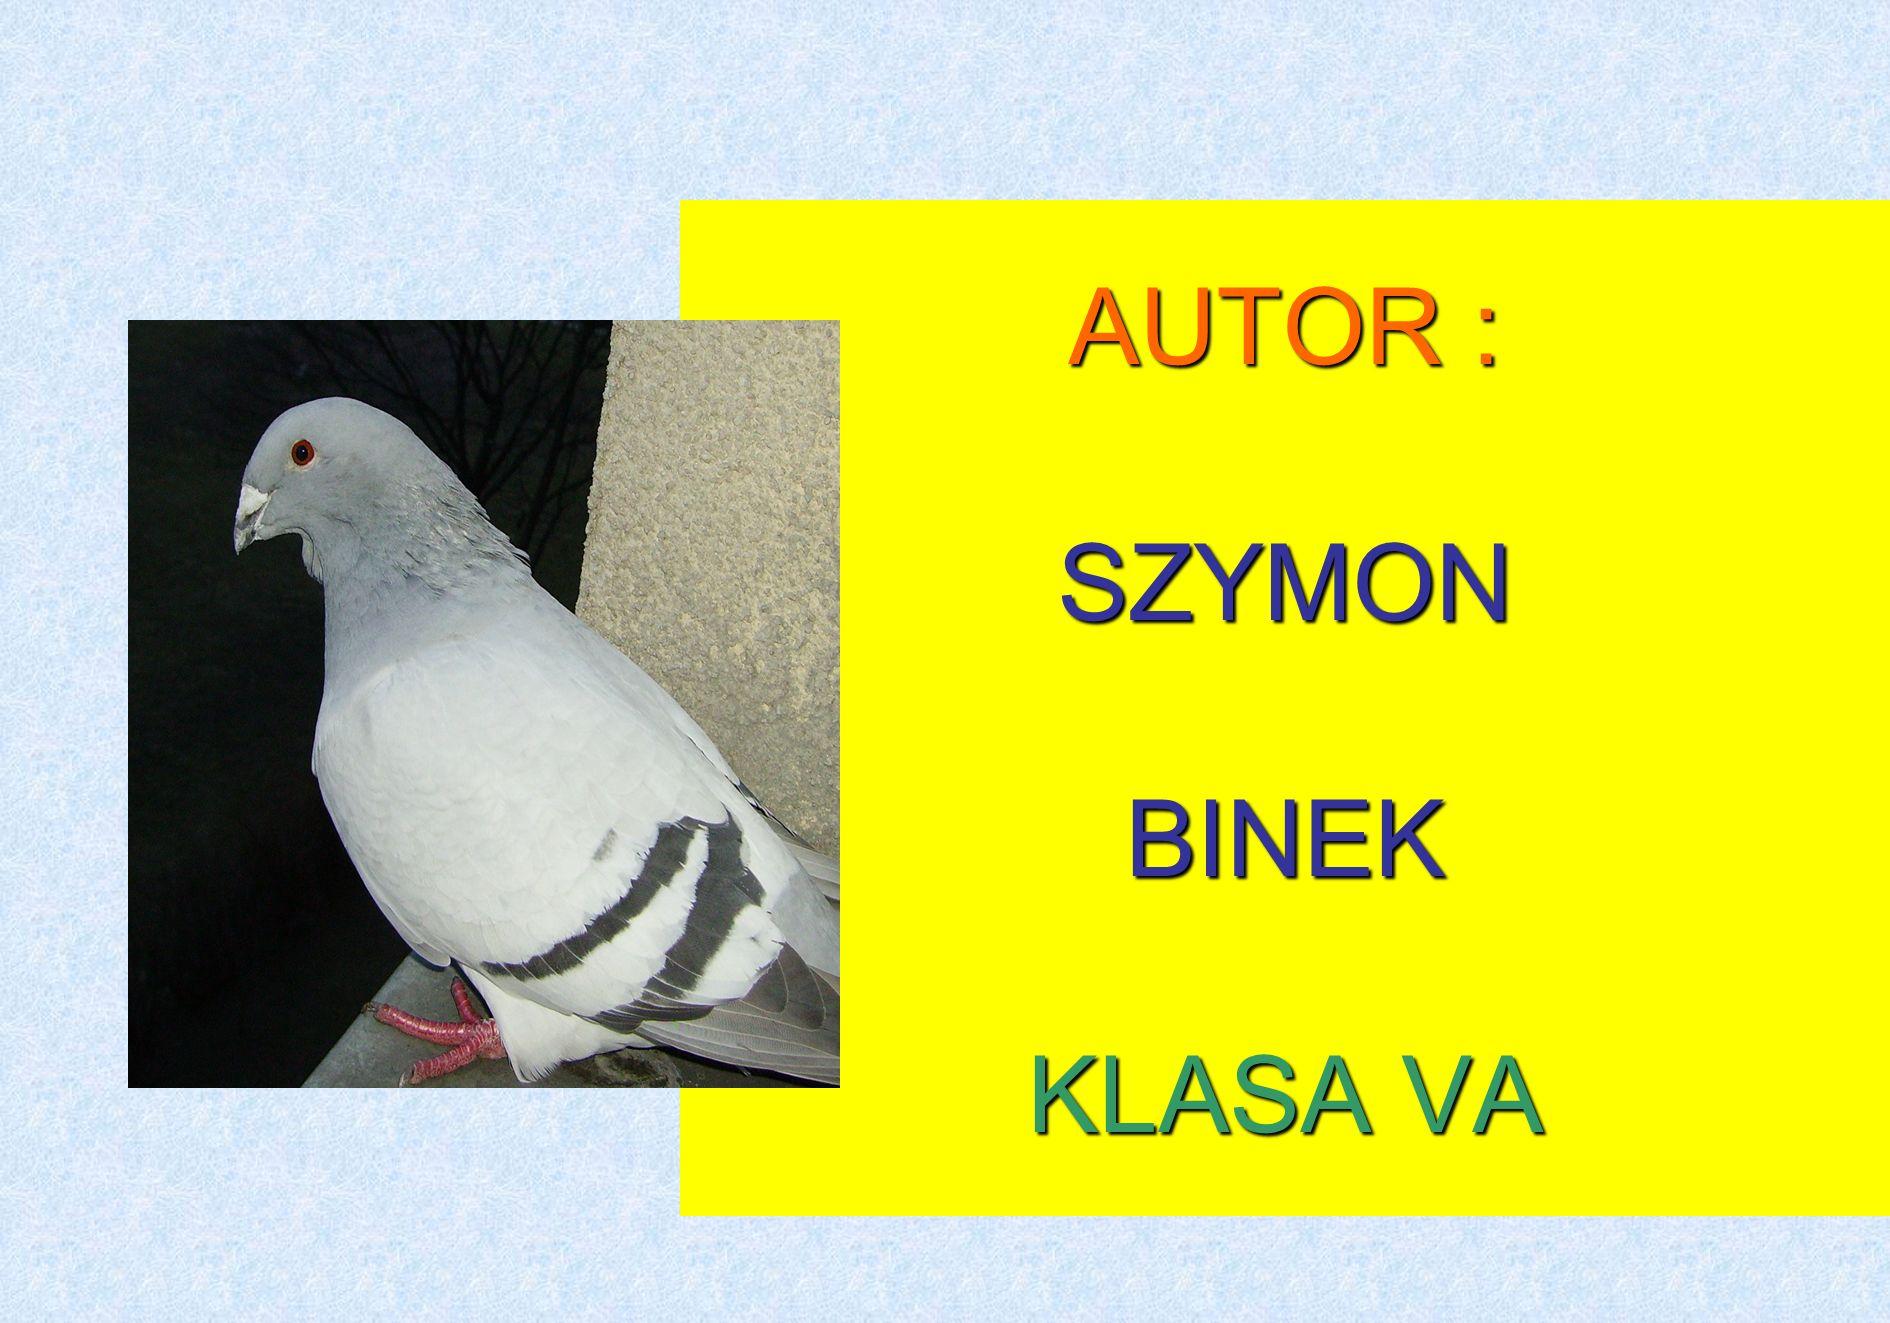 AUTOR : SZYMON BINEK KLASA VA